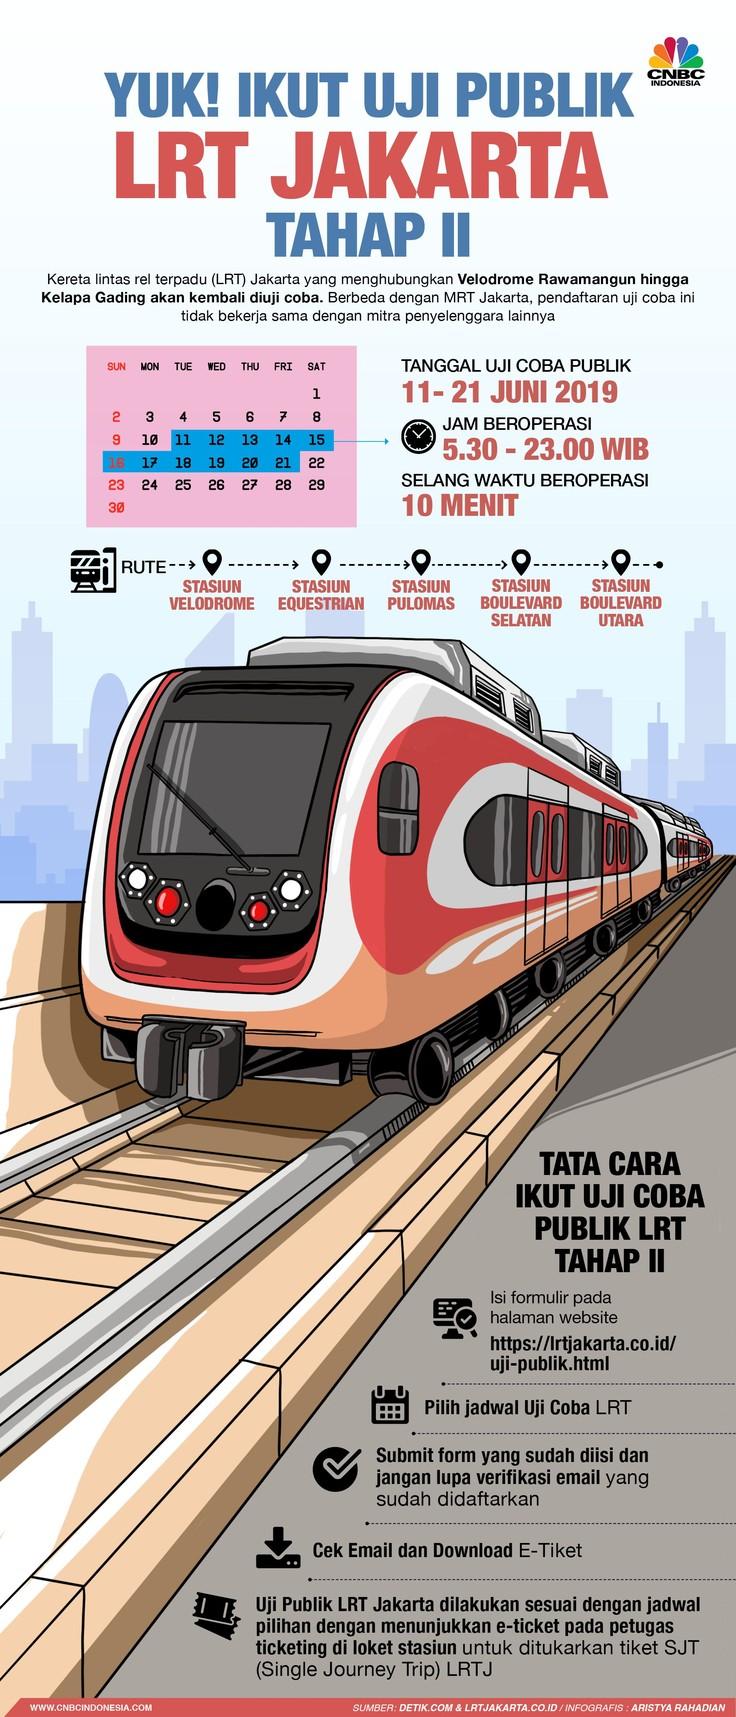 Yuk! Ikut Uji Publik LRT Jakarta Tahap II